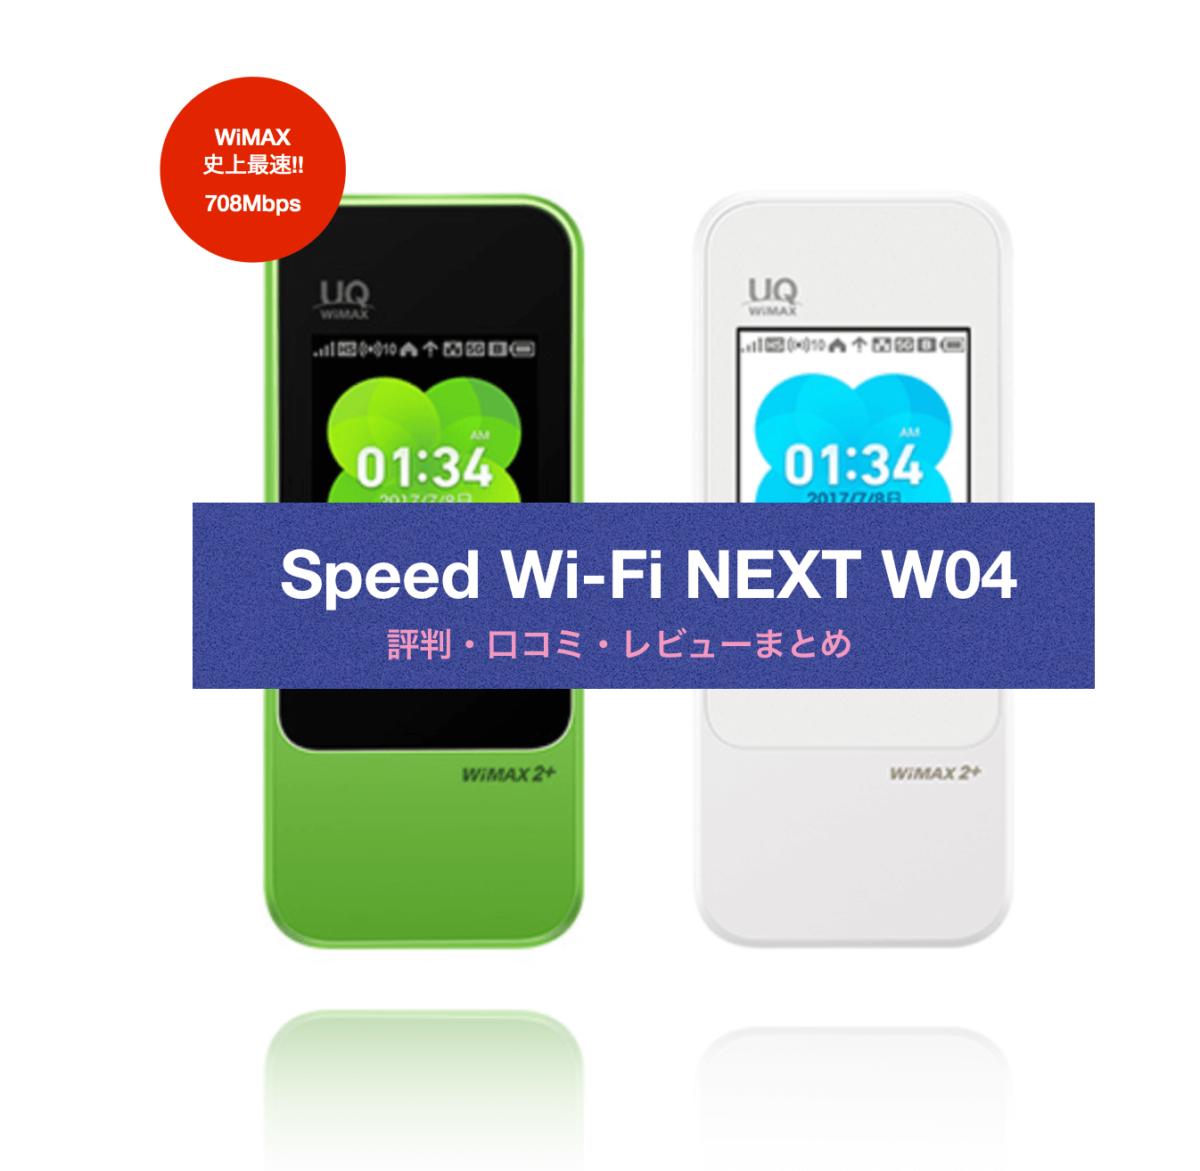 WiMAX史上最速!Speed Wi-Fi NEXT W04の評判・口コミ・レビュー